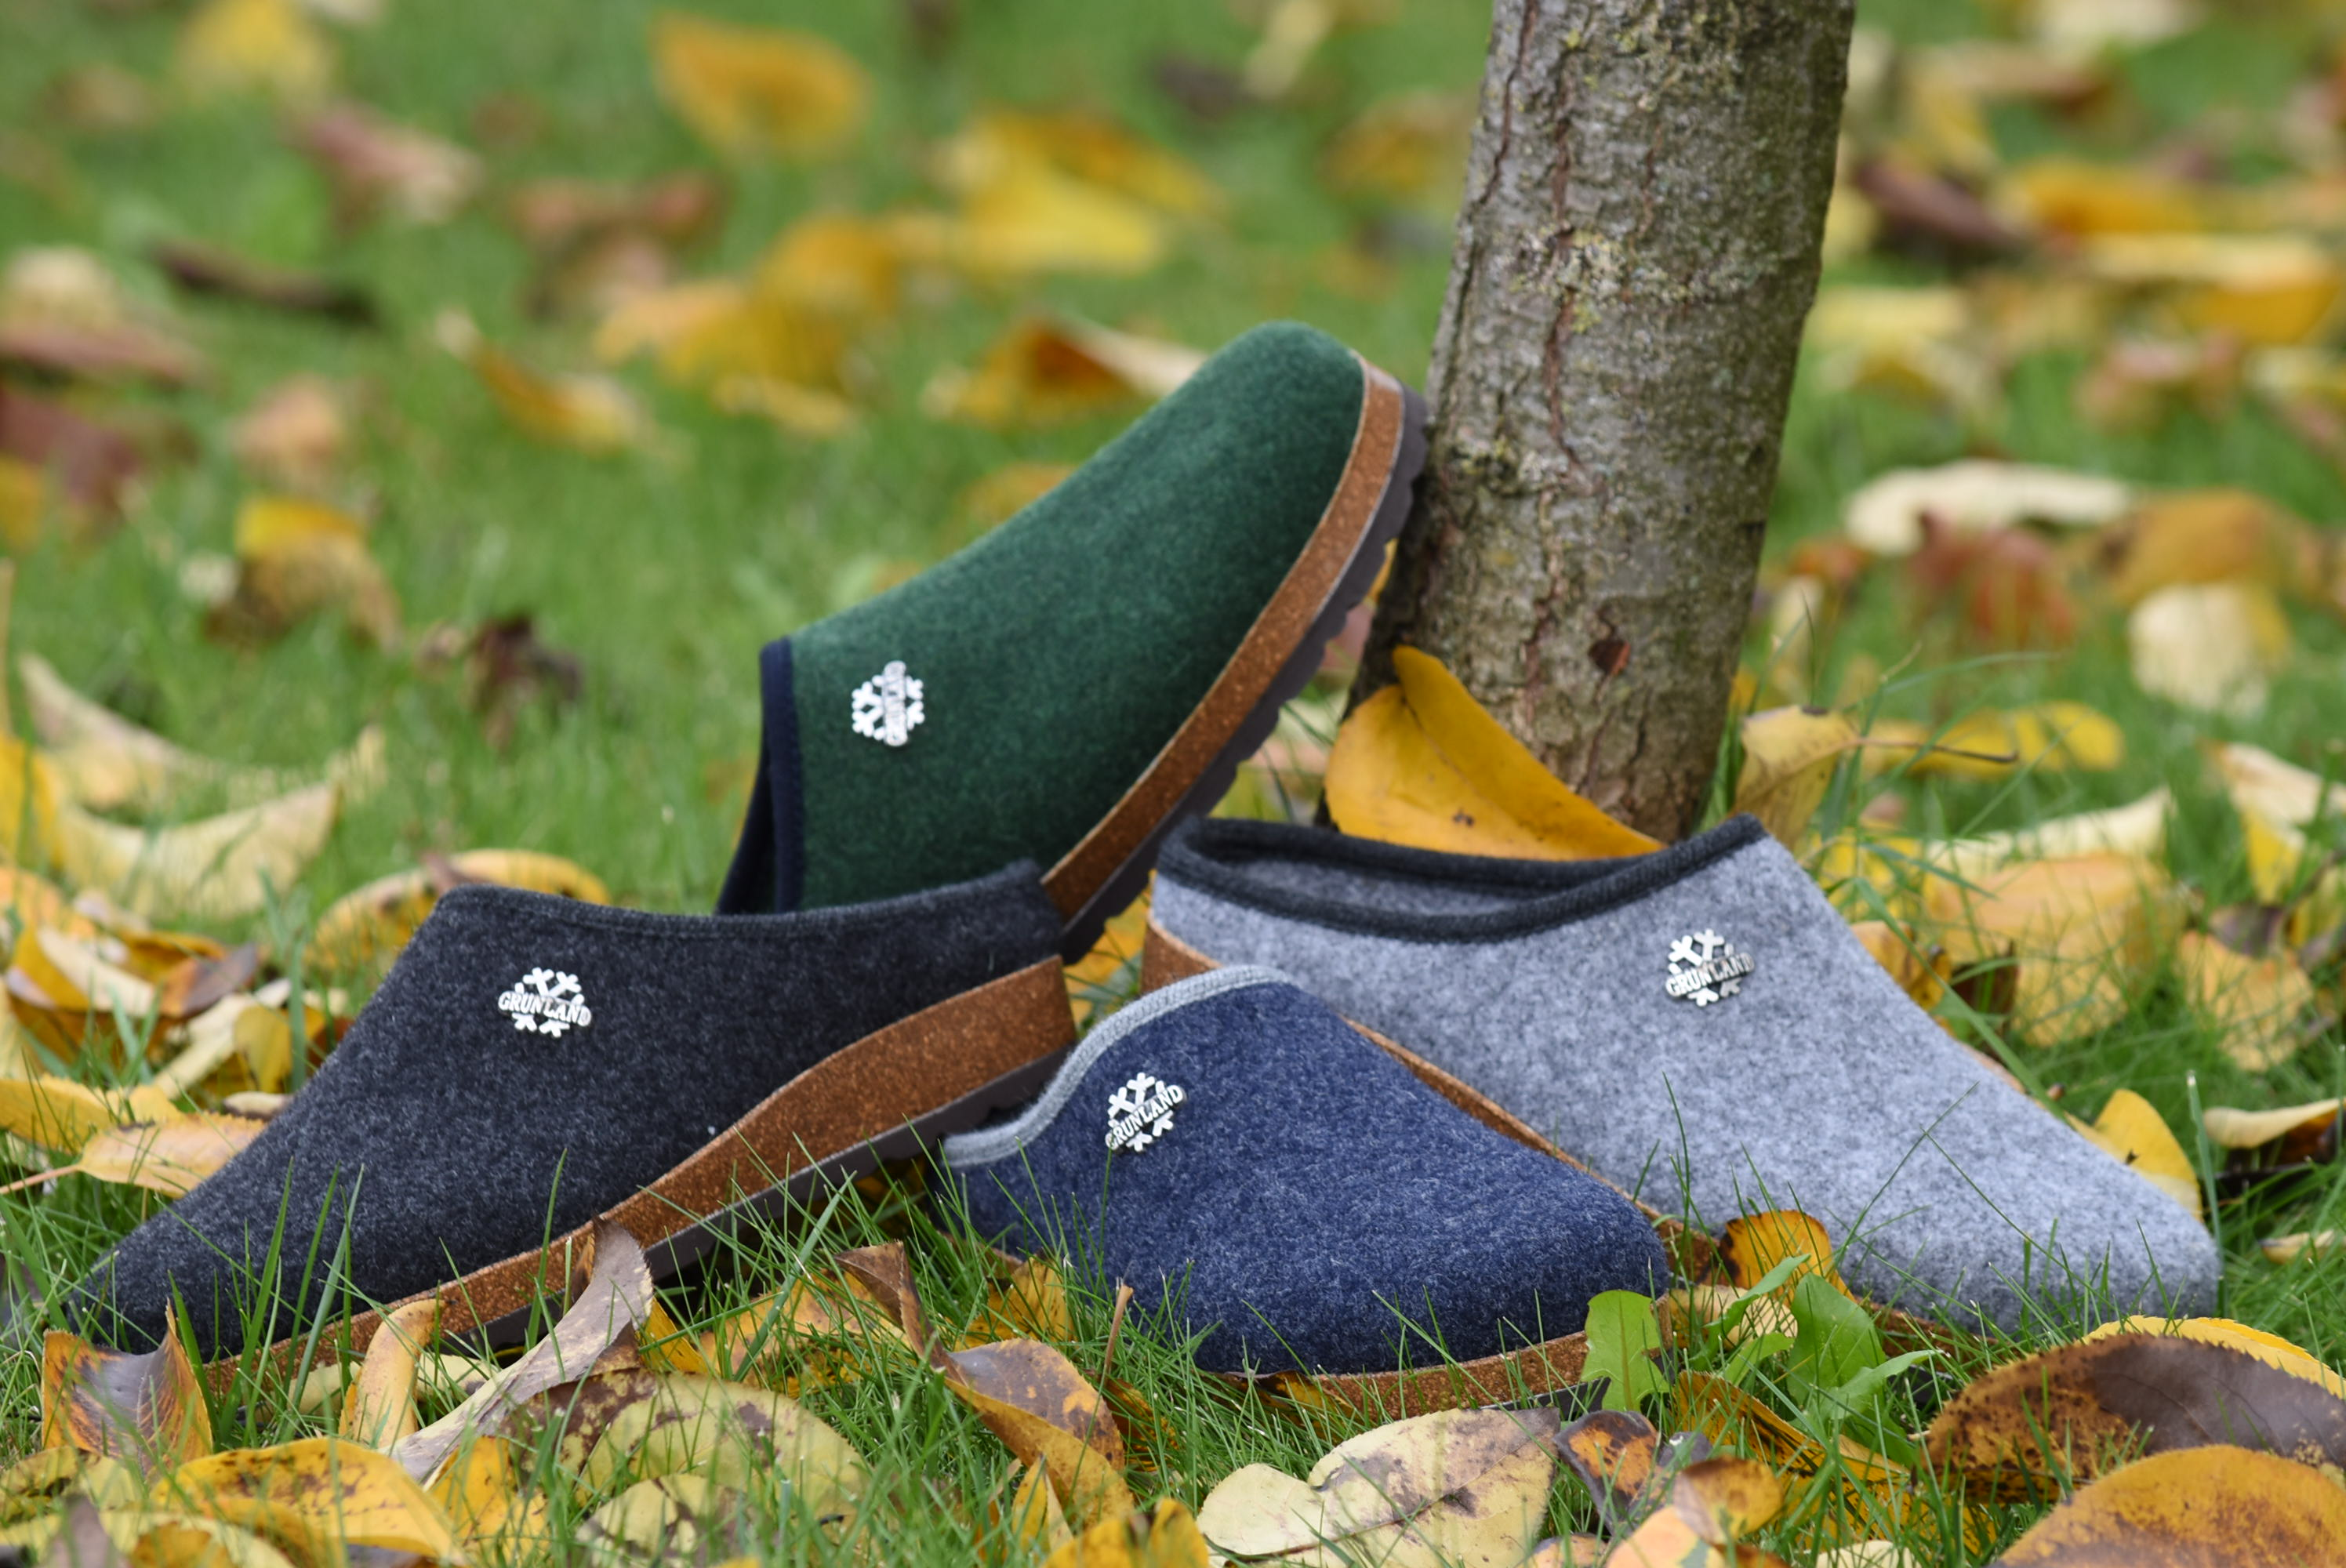 GRUNLAND CB0173 11 Ciabatte Pantofole Tirolese Uomo Lana Cotta Feltro Tirolesi